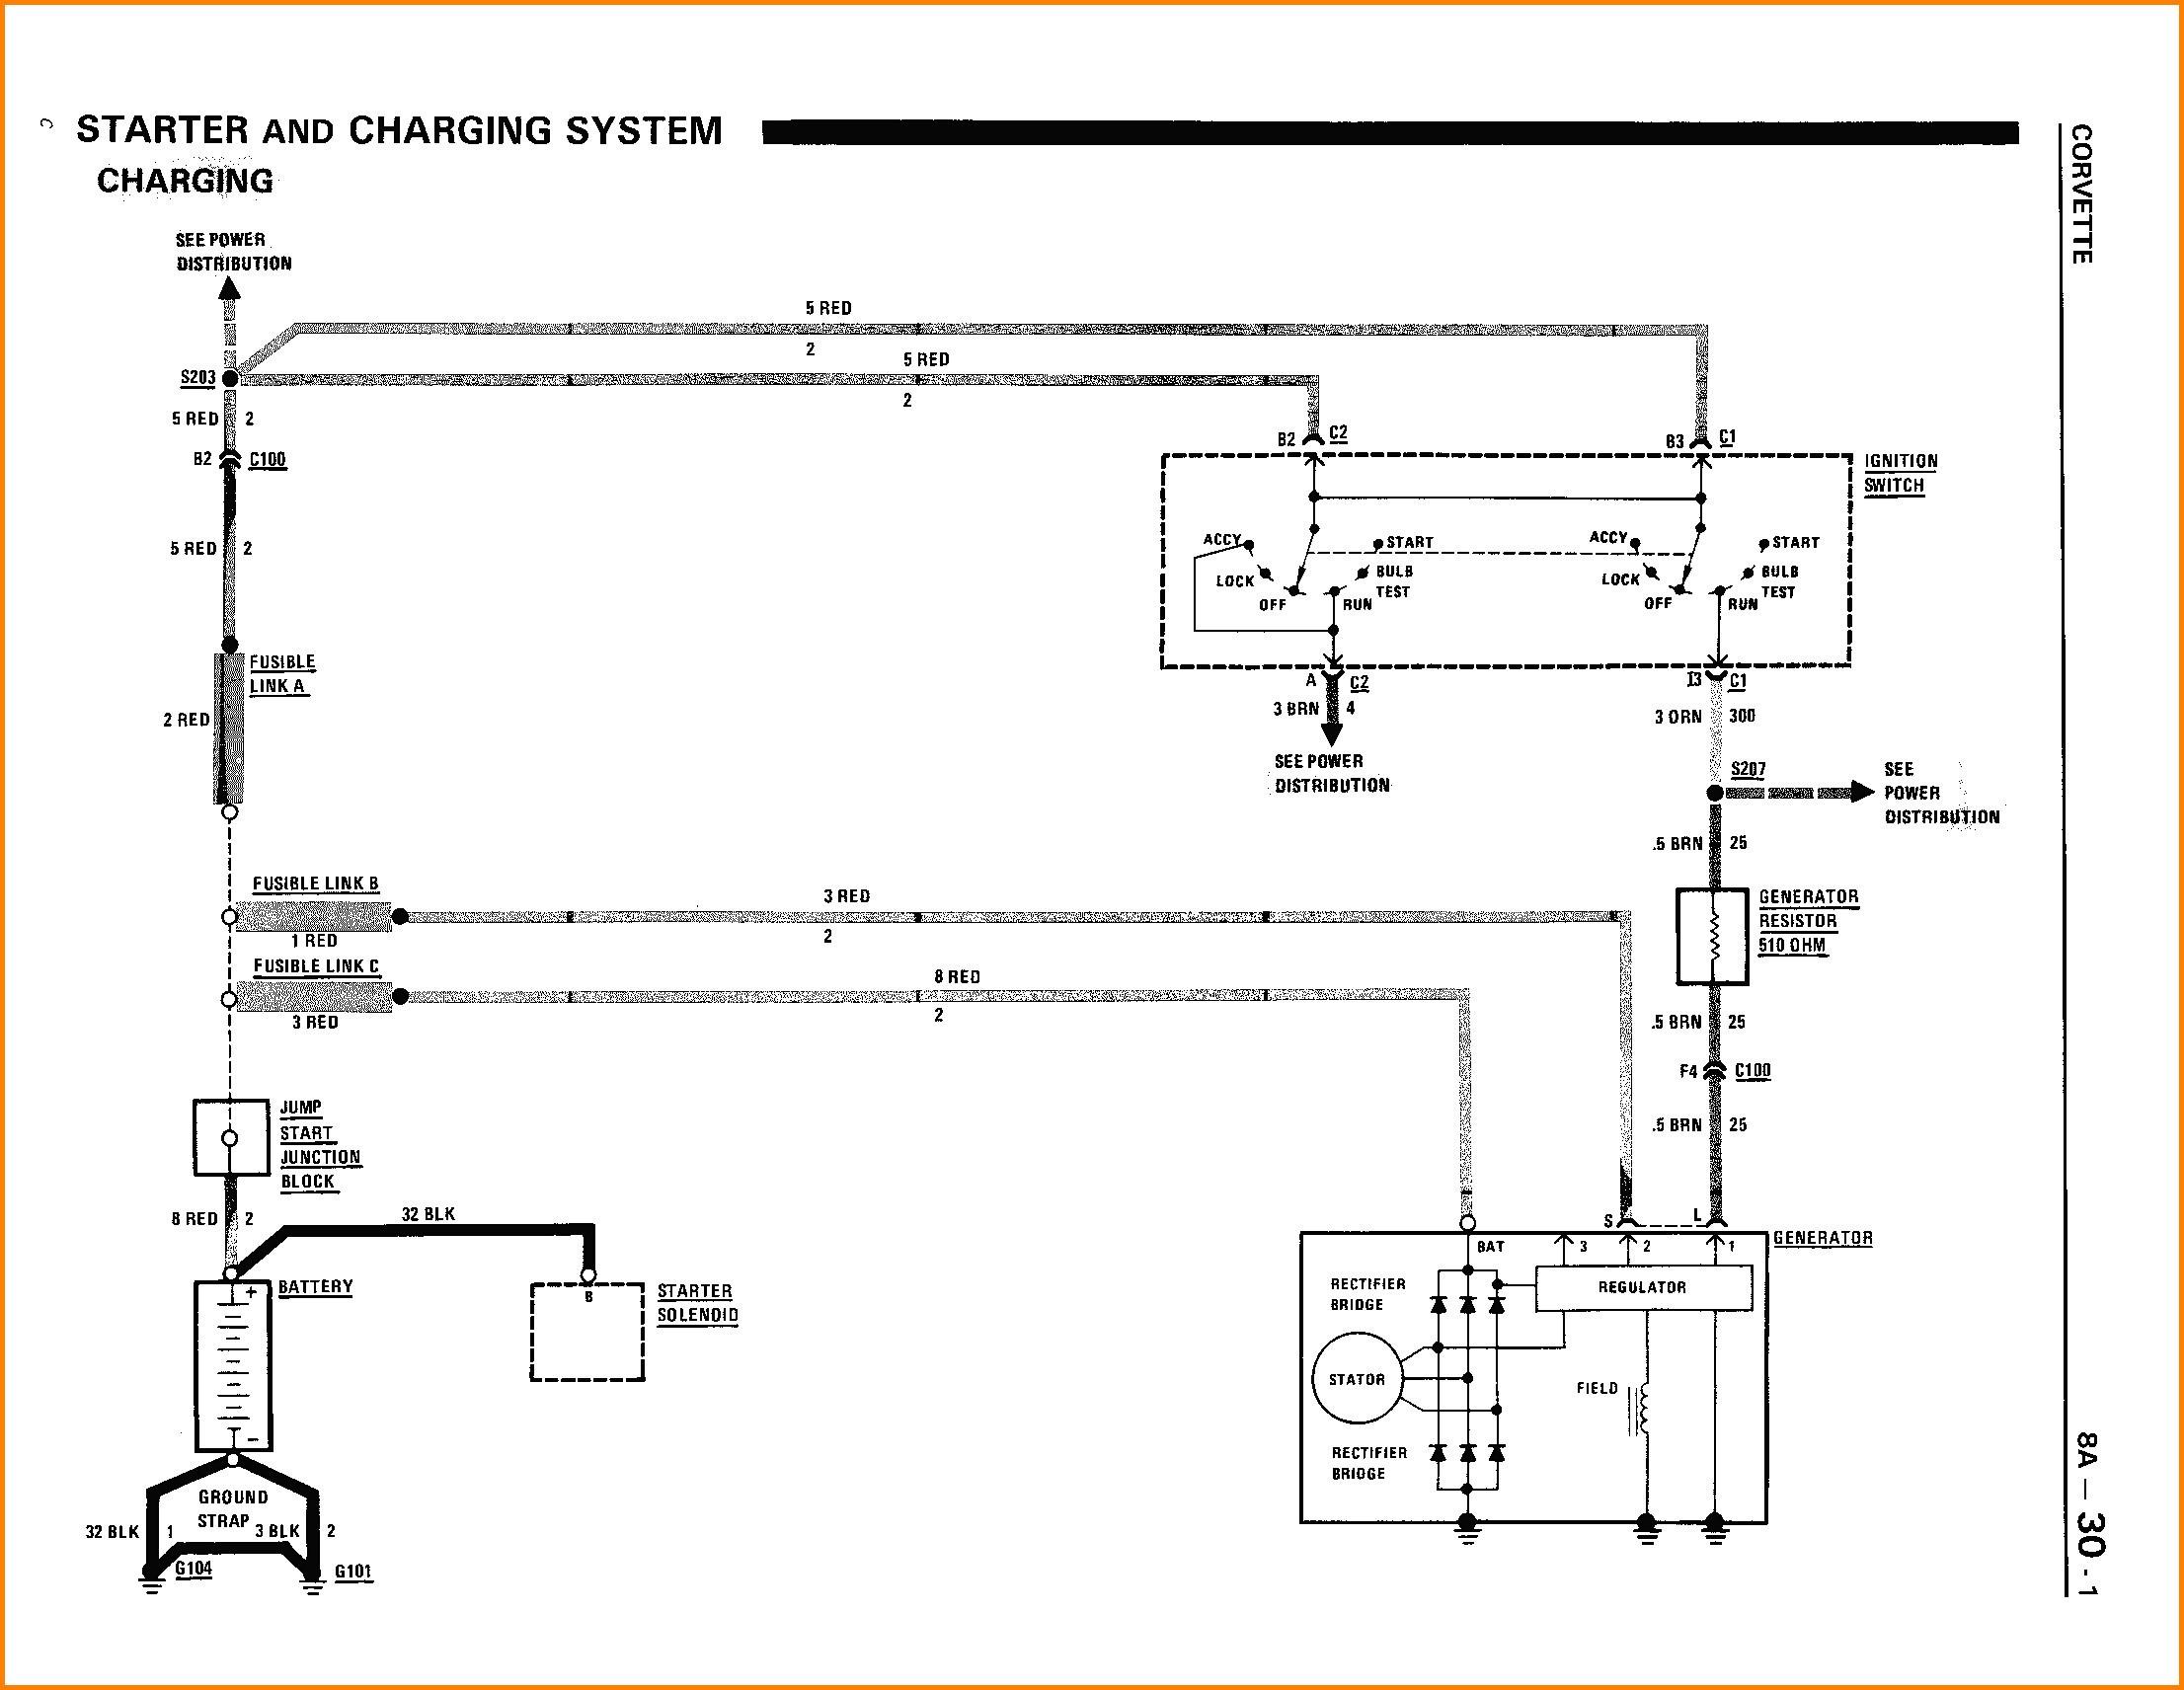 Delco Remy Alternator Wiring Diagram 4 Wire | Shtab - Delco Remy Alternator Wiring Diagram